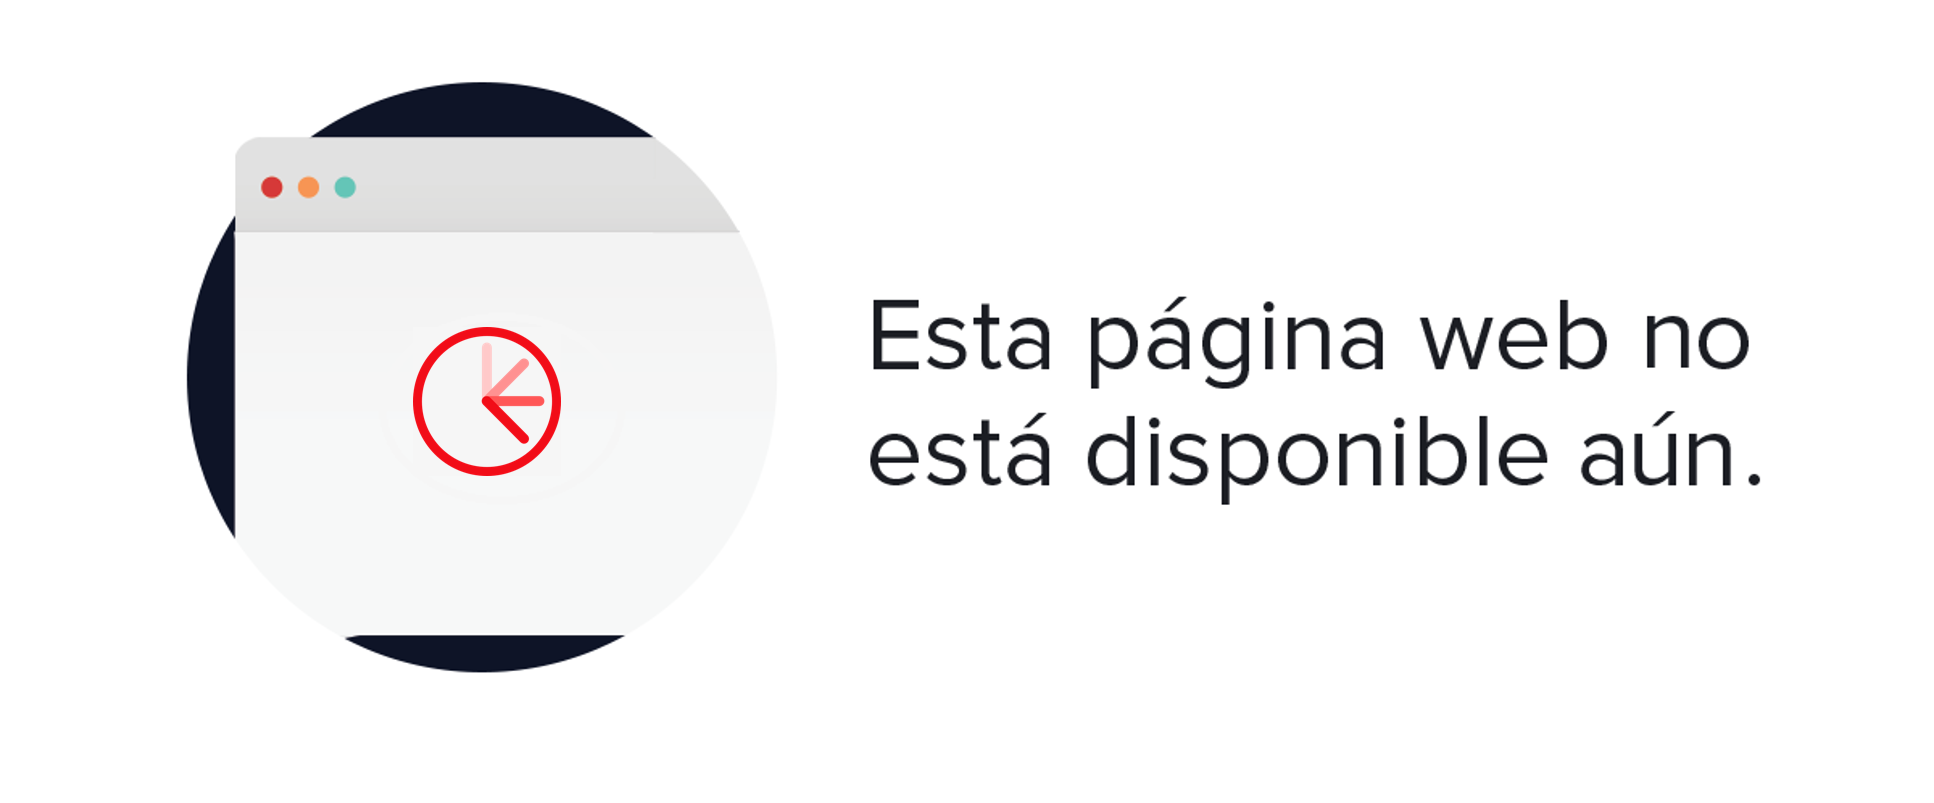 34e1f590d65f7 adidas clasicas mujer blancas 2018 adidas zapatillas spain.